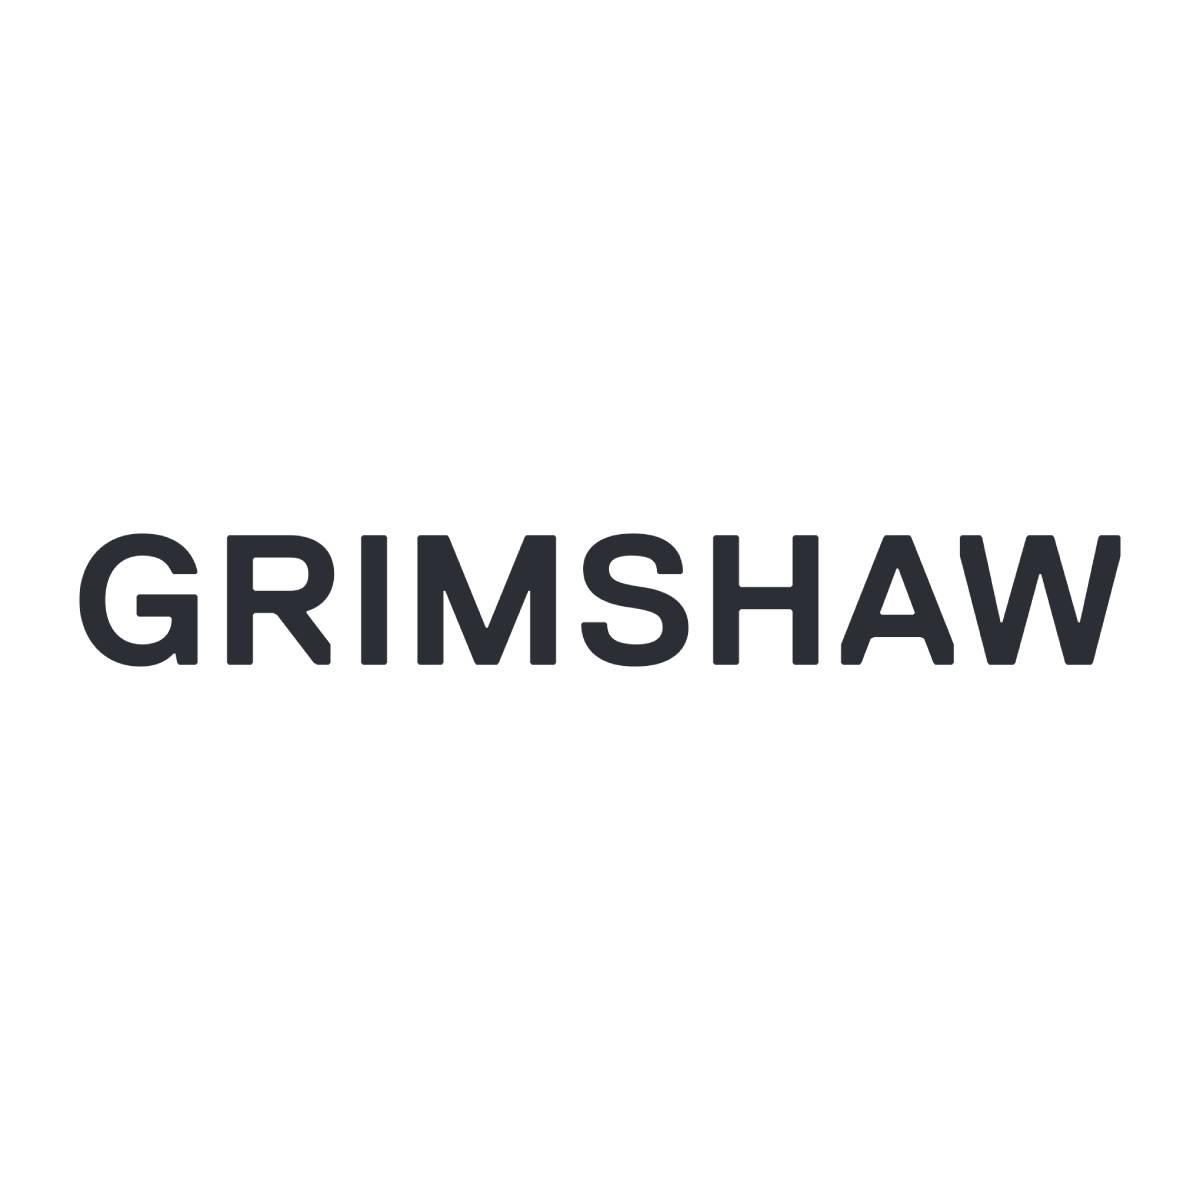 Grimshaw logo.jpg